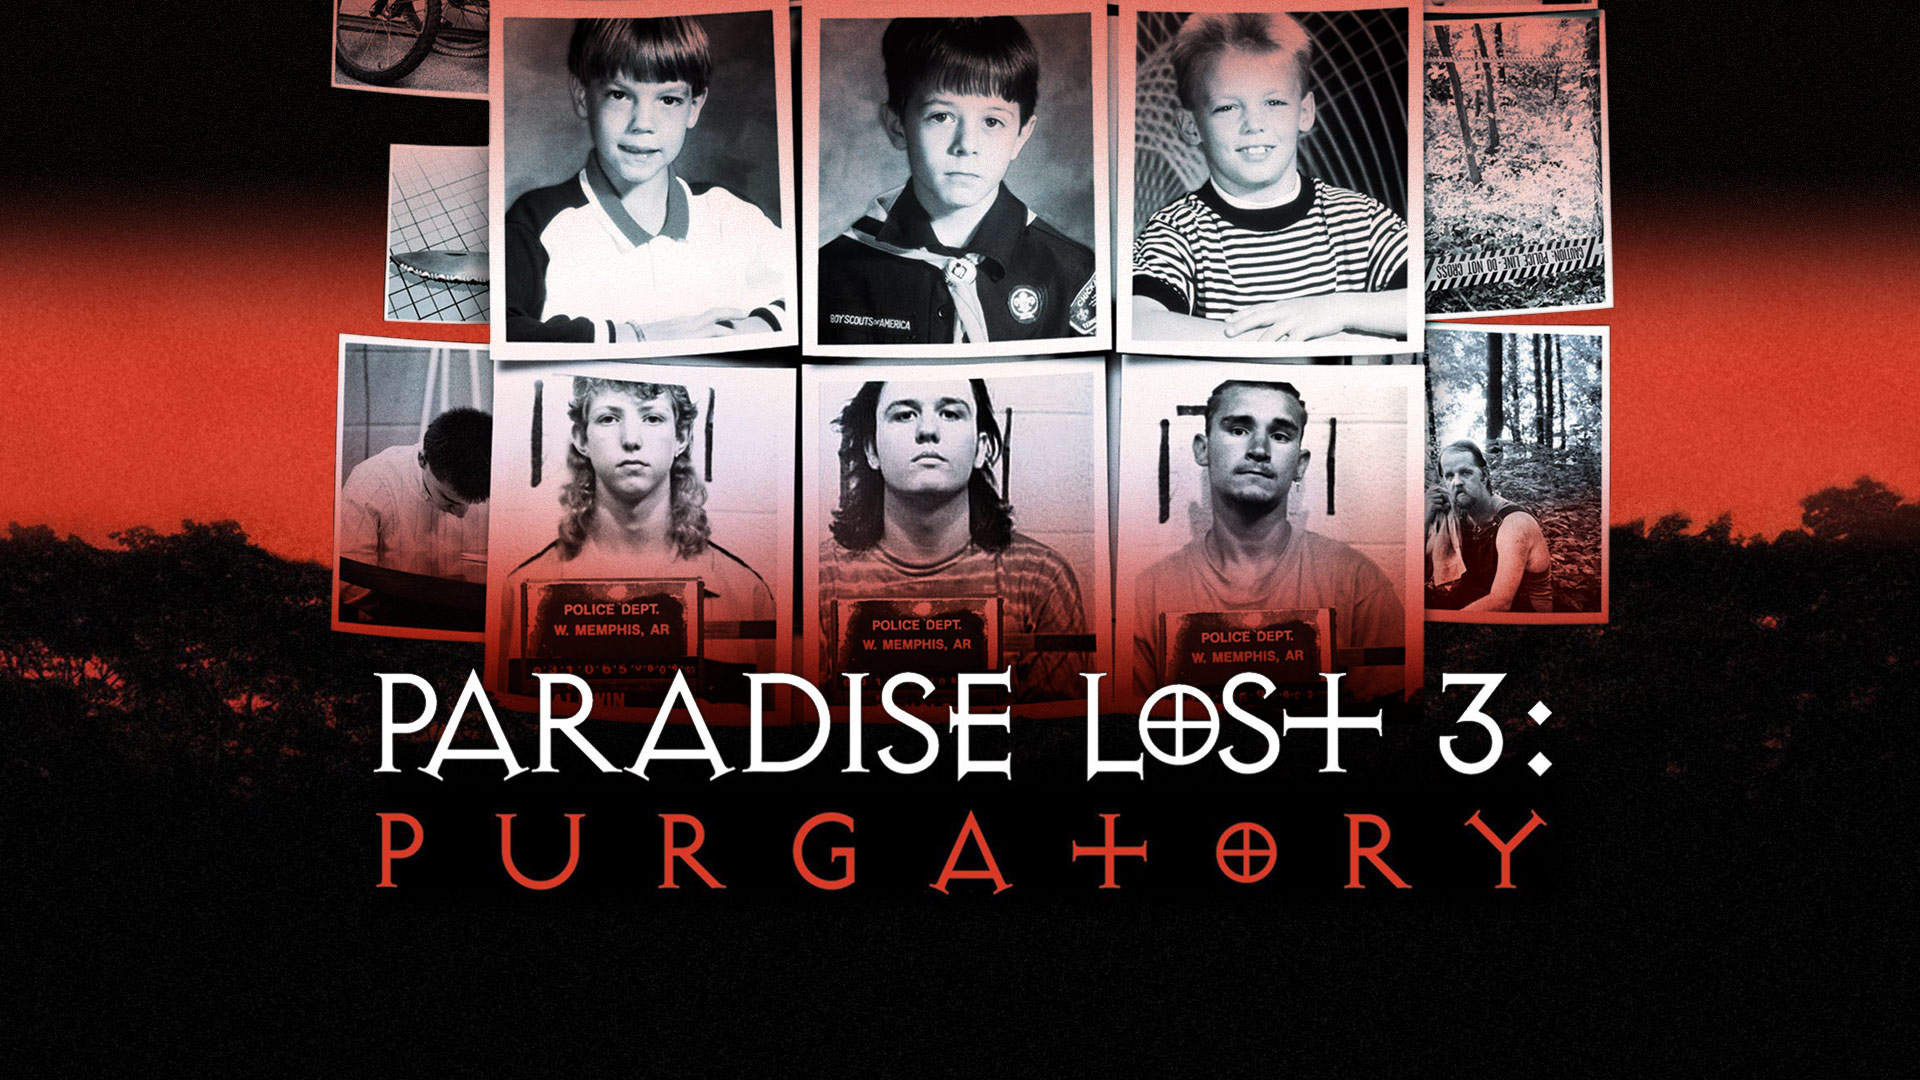 Paradise Lost 3 Purgatory